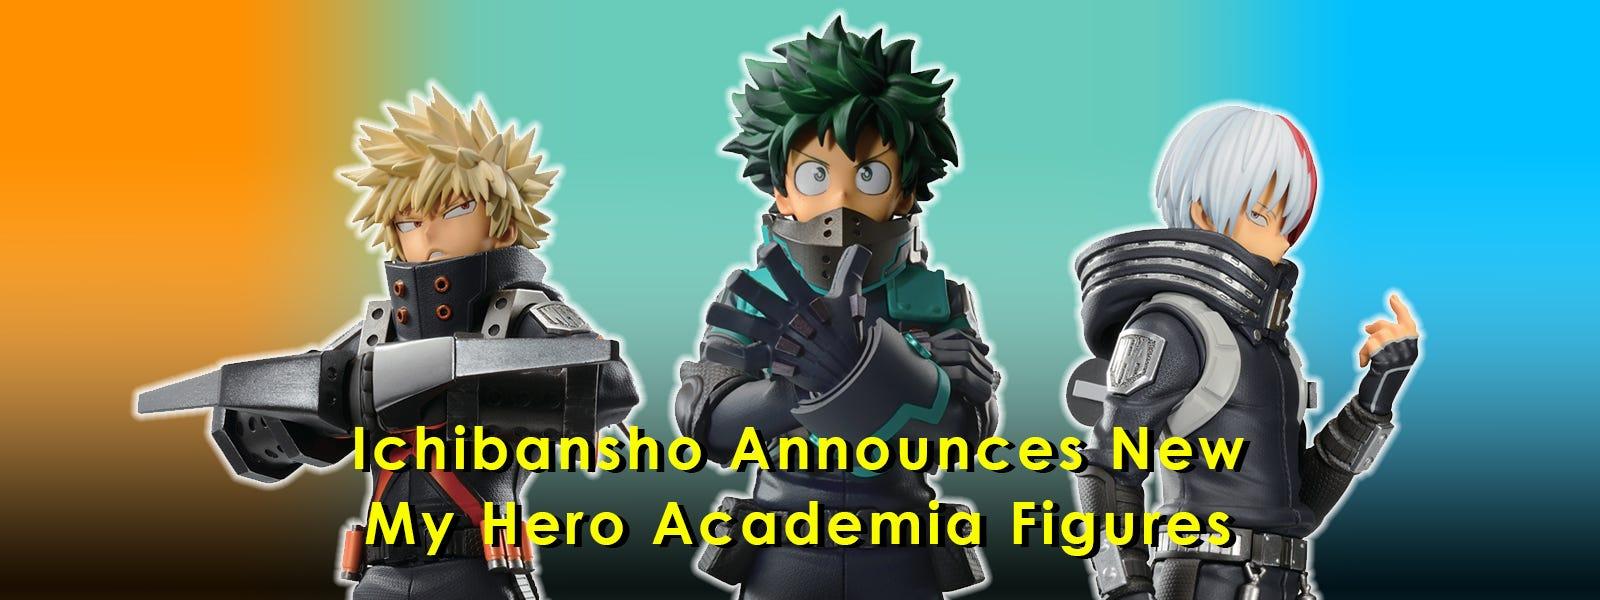 Ichibansho Announces New My Hero Academia Figures